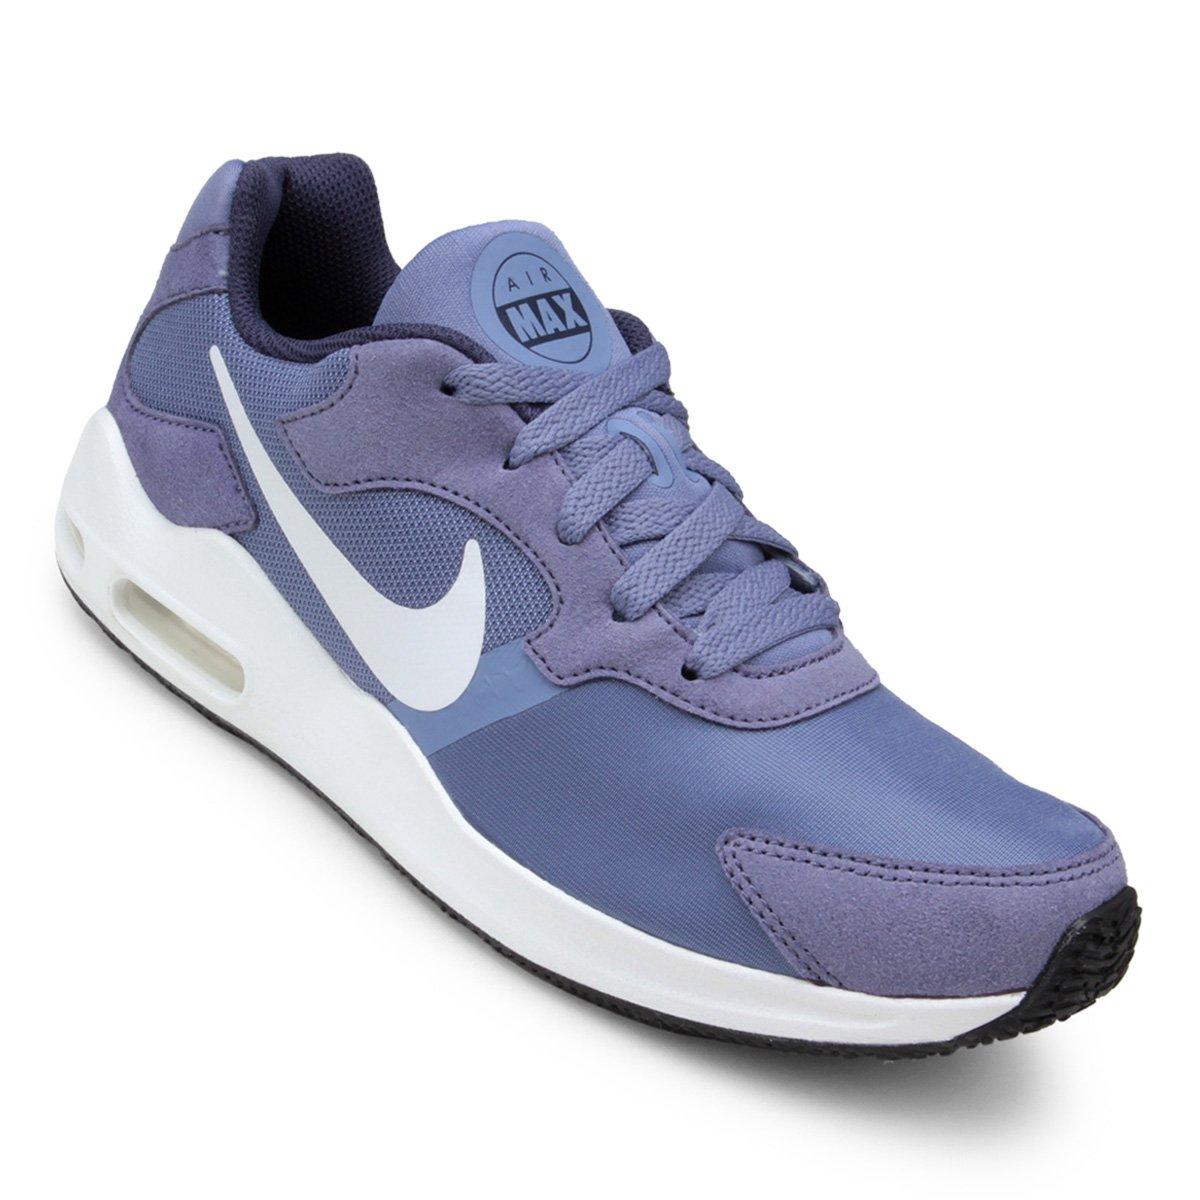 eabd49e74e19 Tênis Nike Wmns Air Max Guile Feminino - Roxo e Branco - Compre Agora